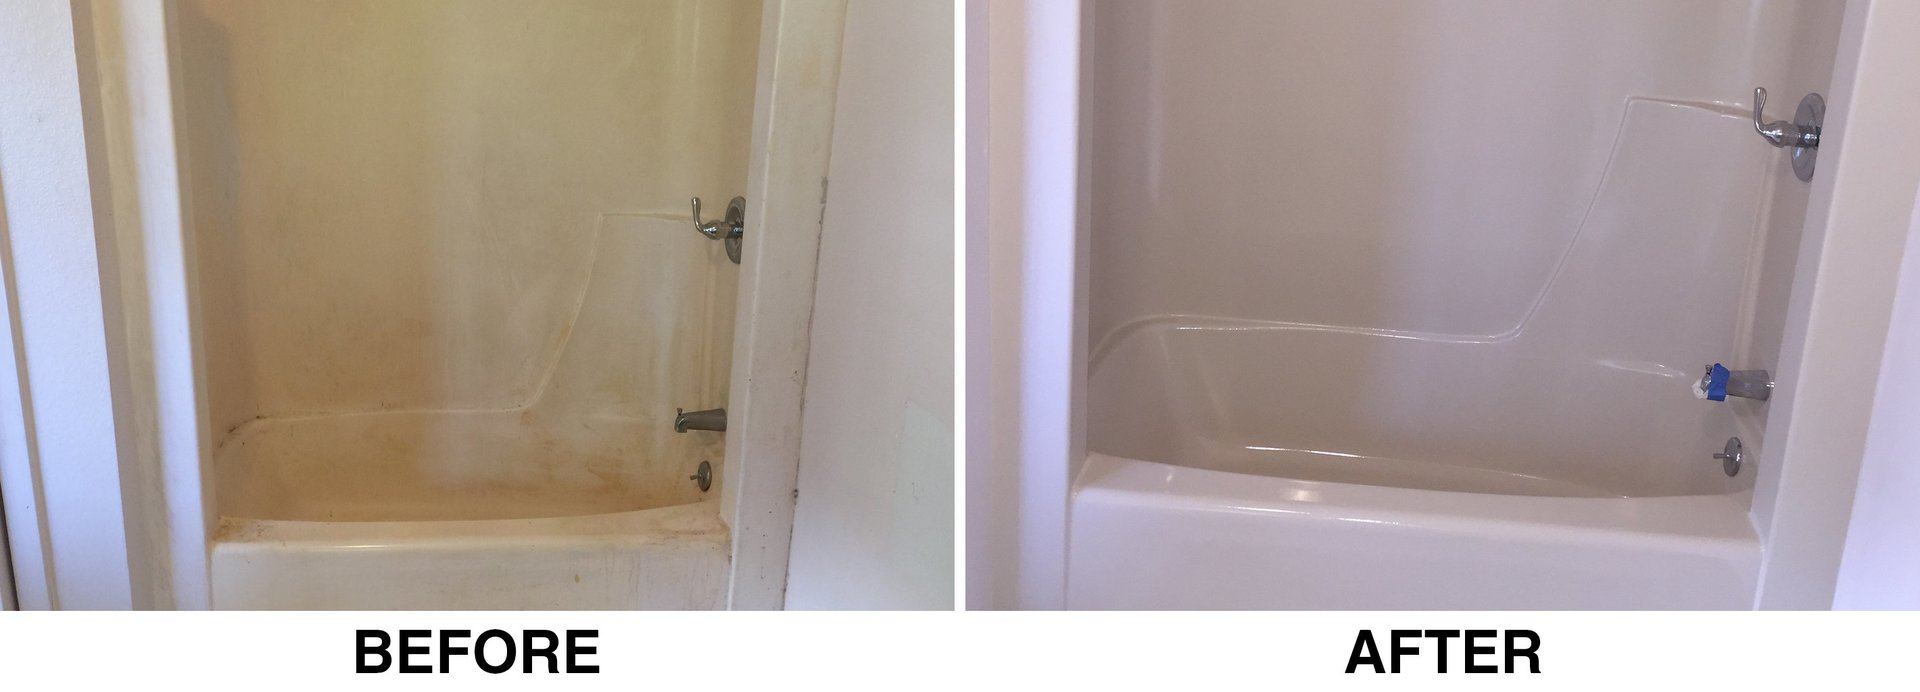 Bathtub & Shower Refinishing Co. of Hawaii image 2